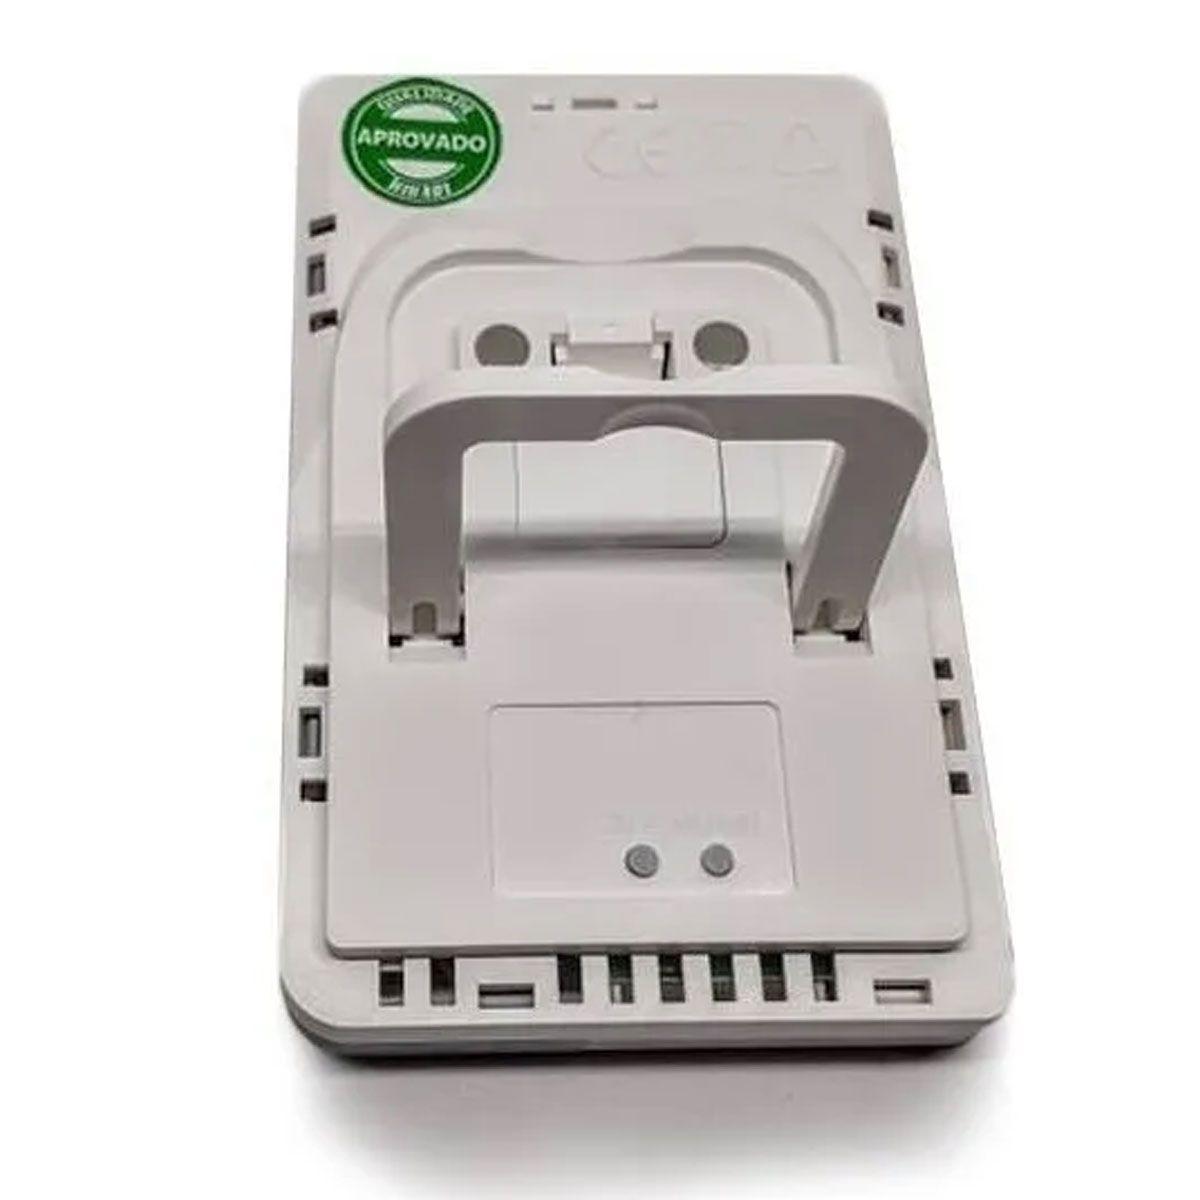 Termo-Higrômetro (Mede Temperatura e Umidade) Digital HTH-241 - HIKARI-21N237